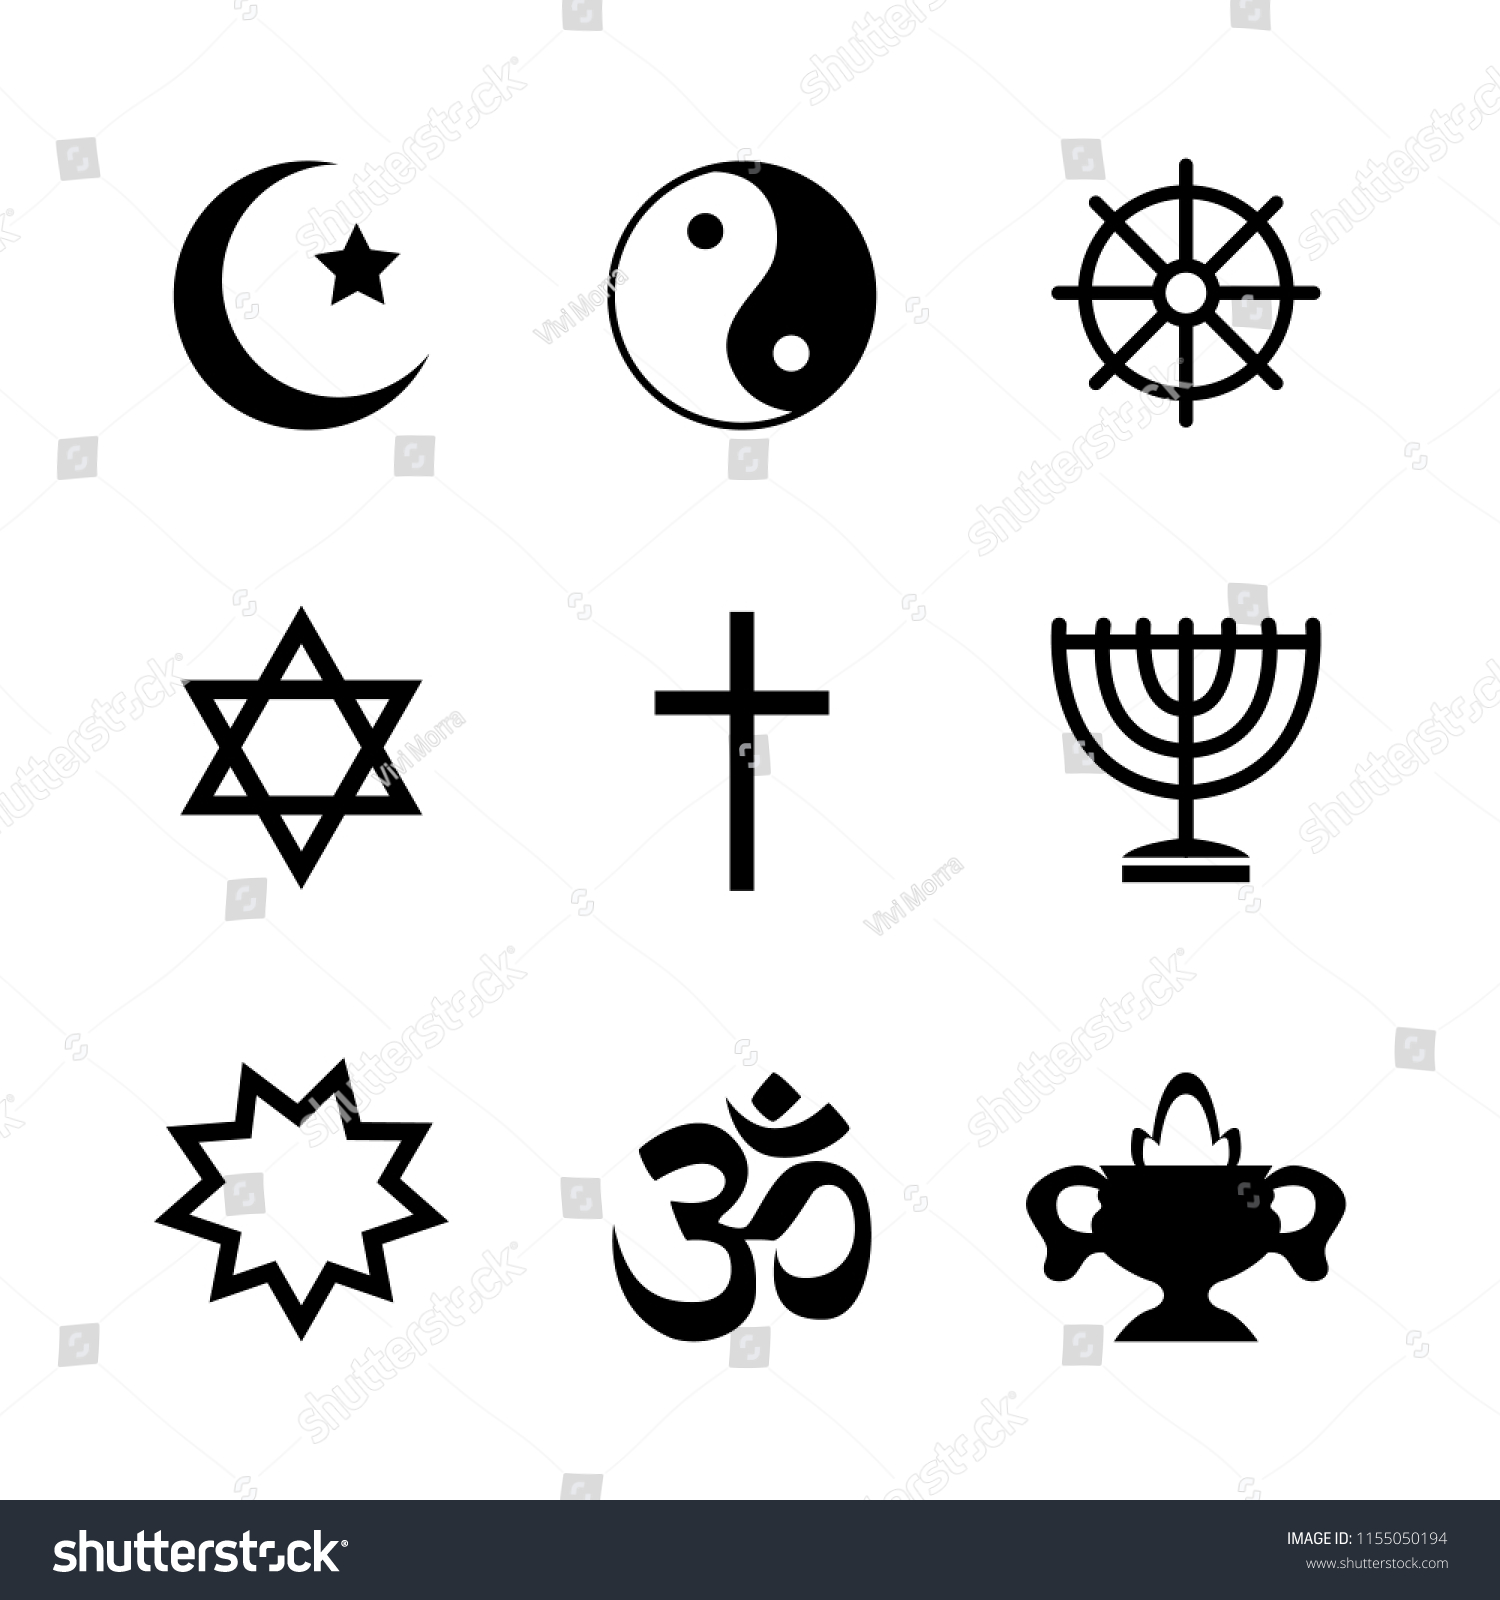 Icons Denoting Different Religious Symbols Vector Stock Vector